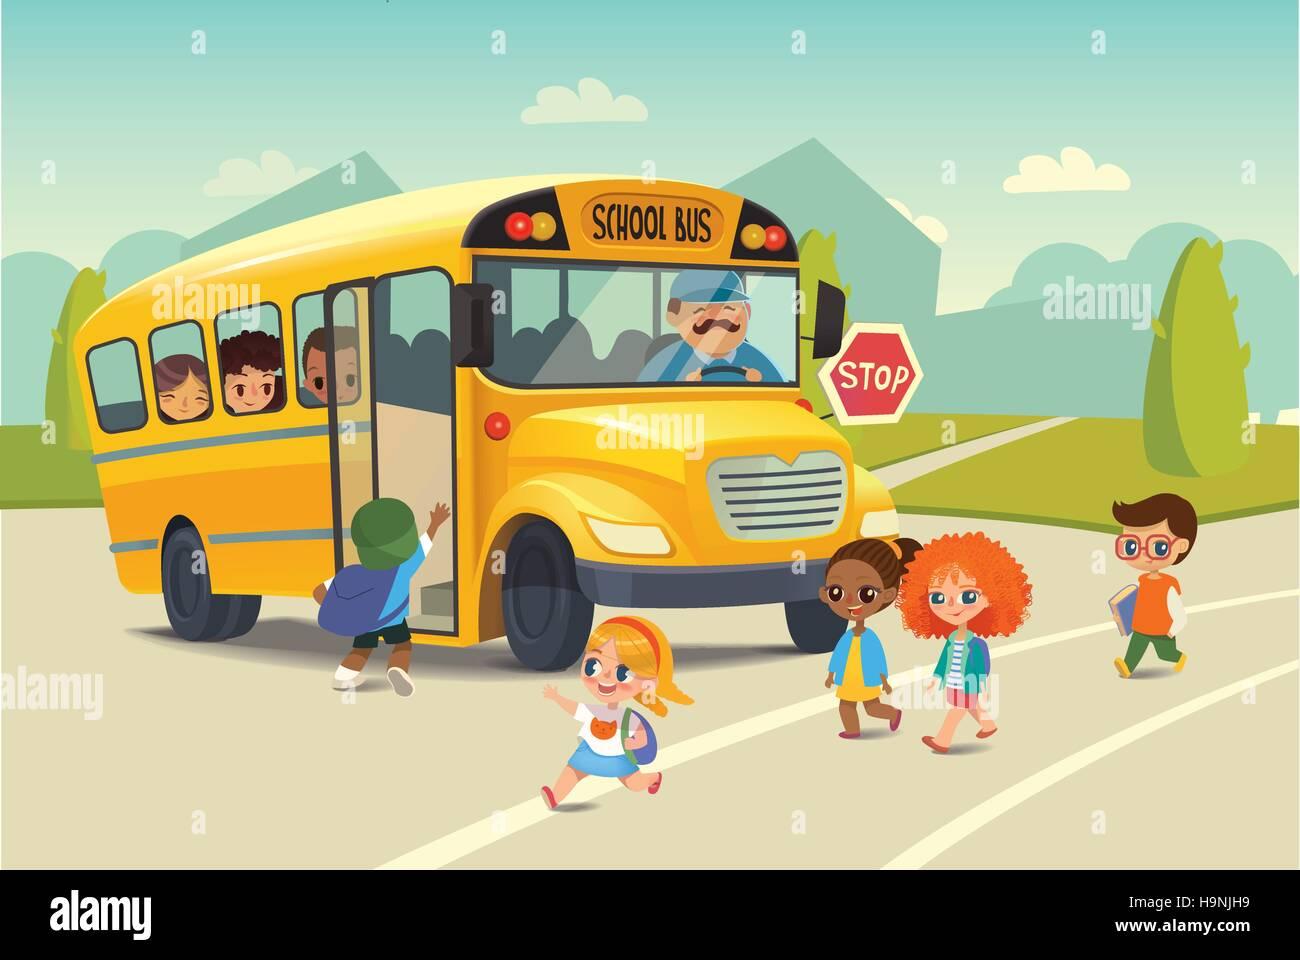 school bus traffic stop law backtoschool safety concept